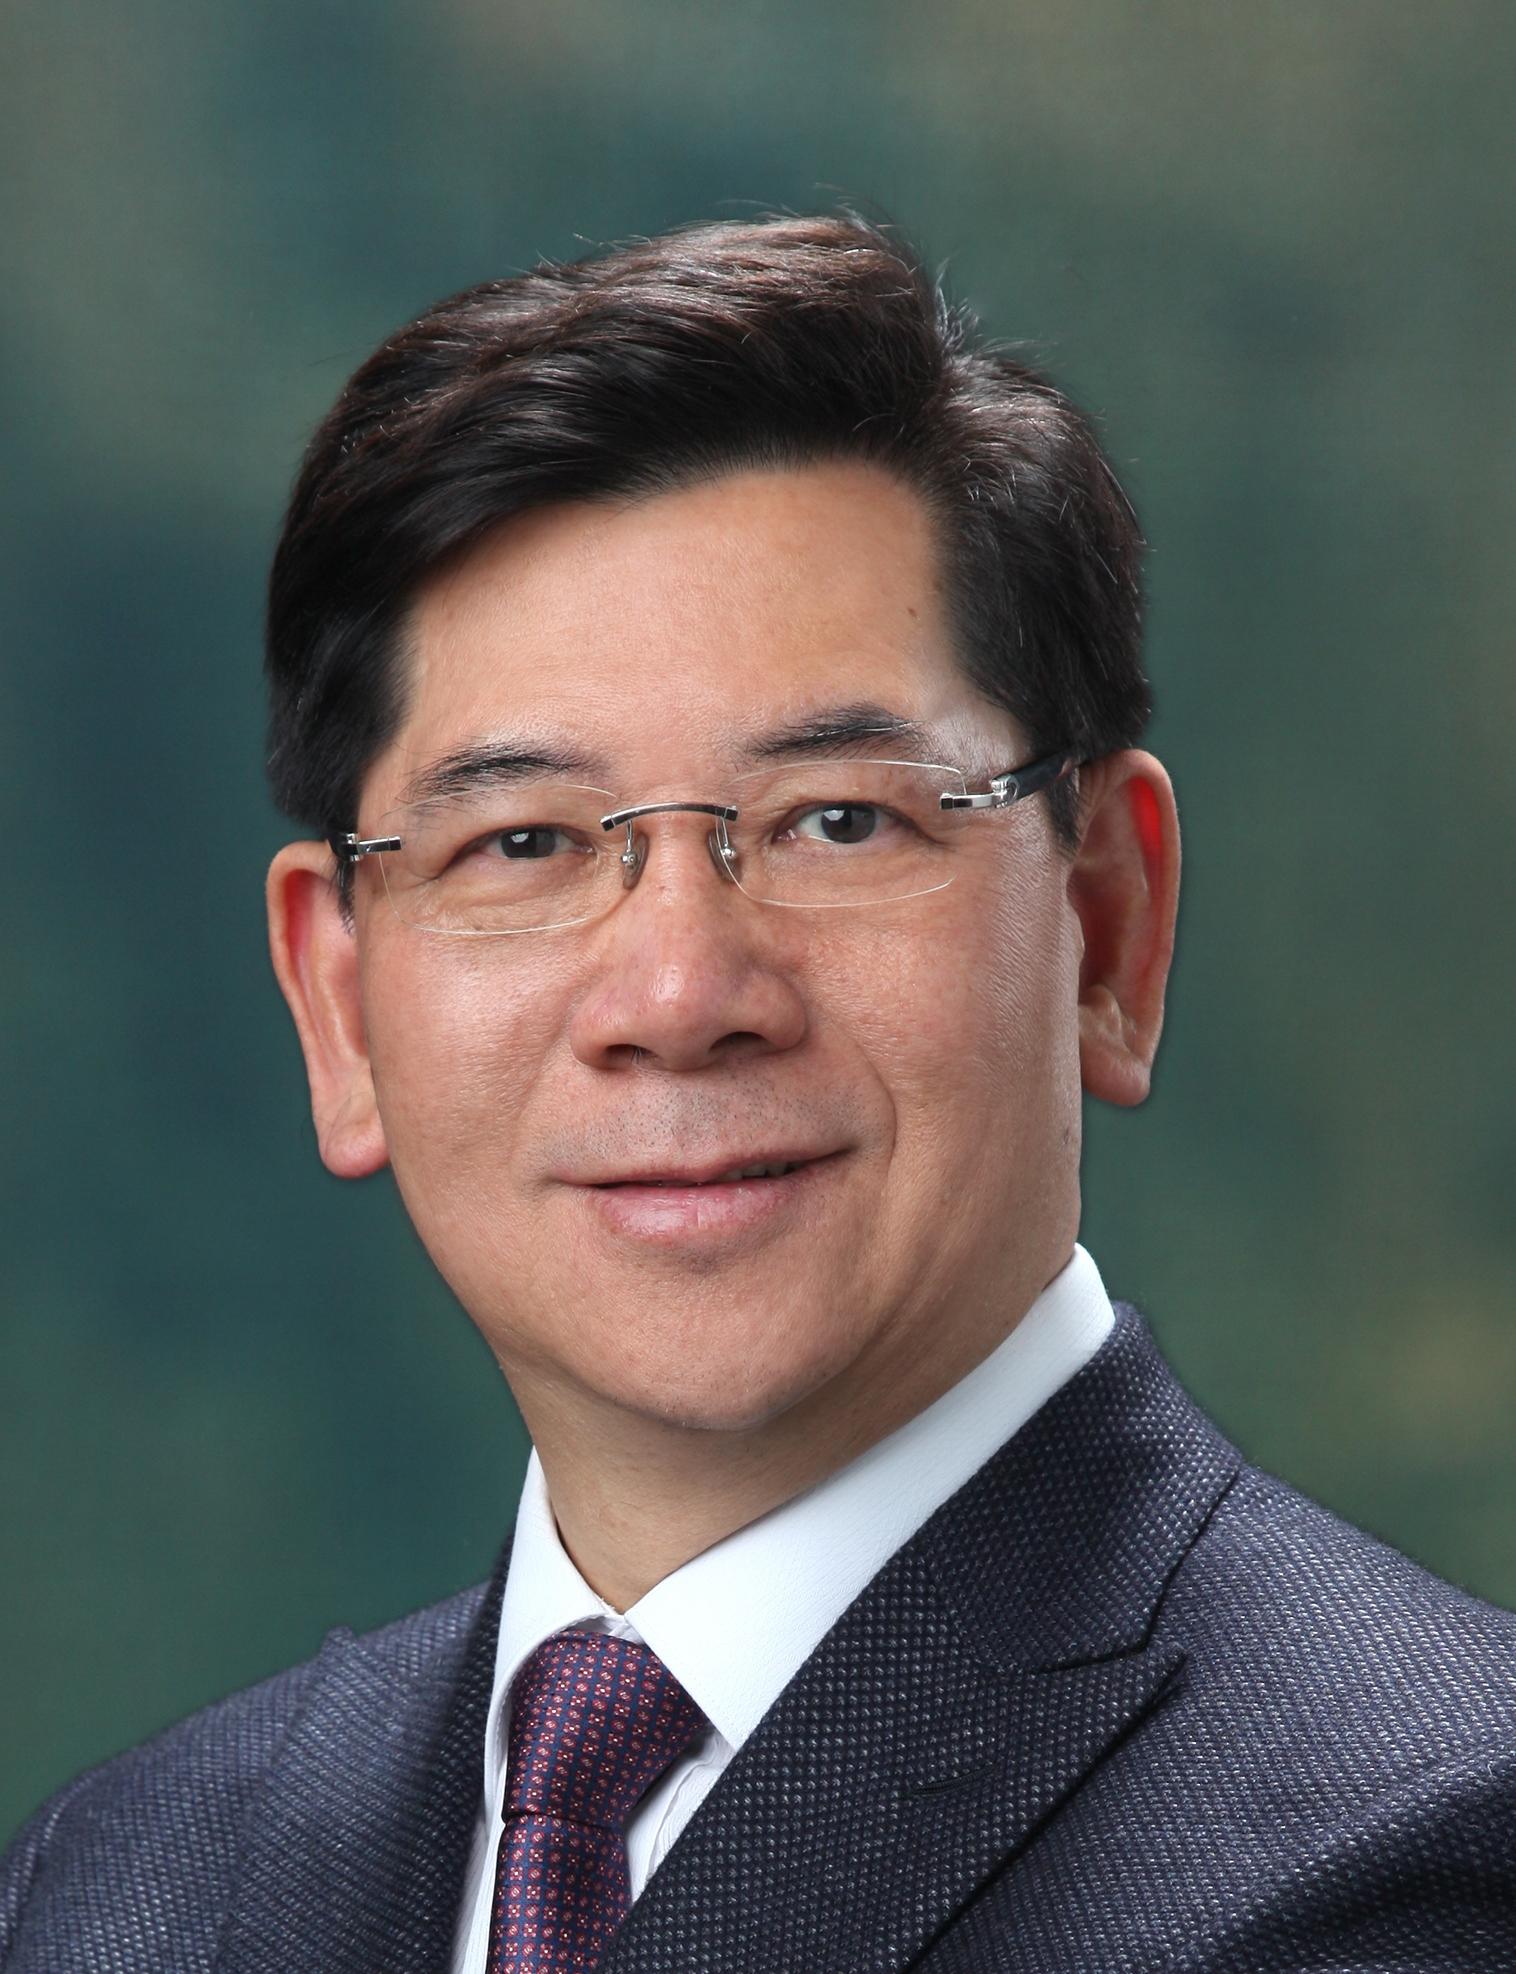 Samuel Yung